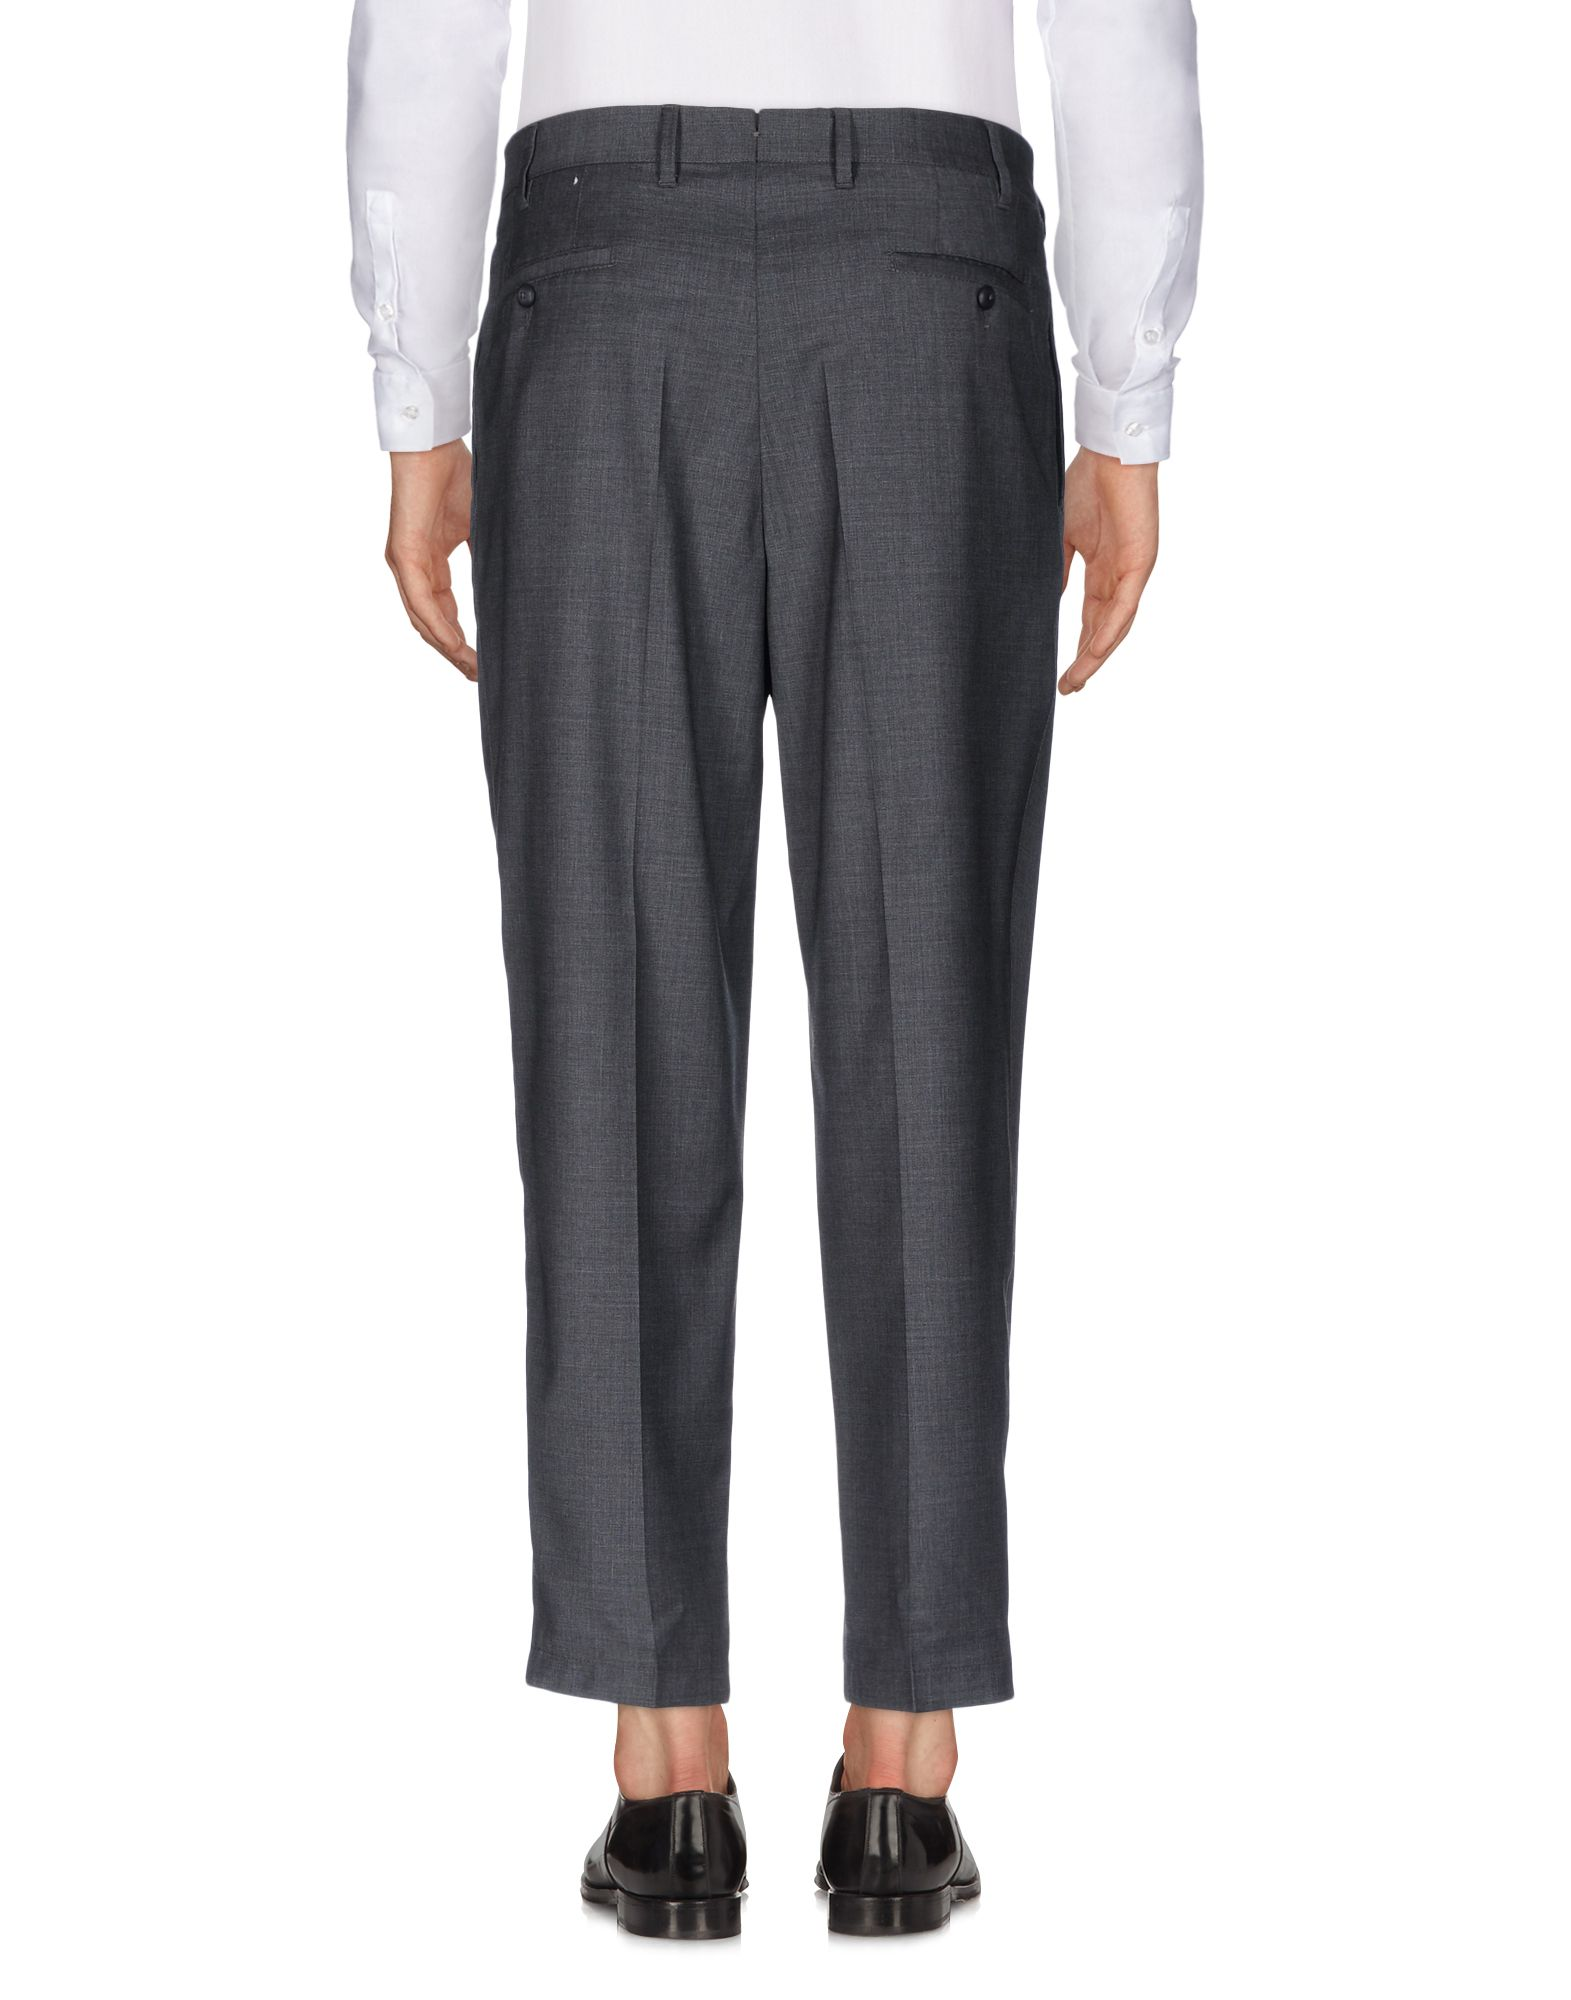 Pantalone The The Pantalone Gigi Uomo - 13082838GC b61952